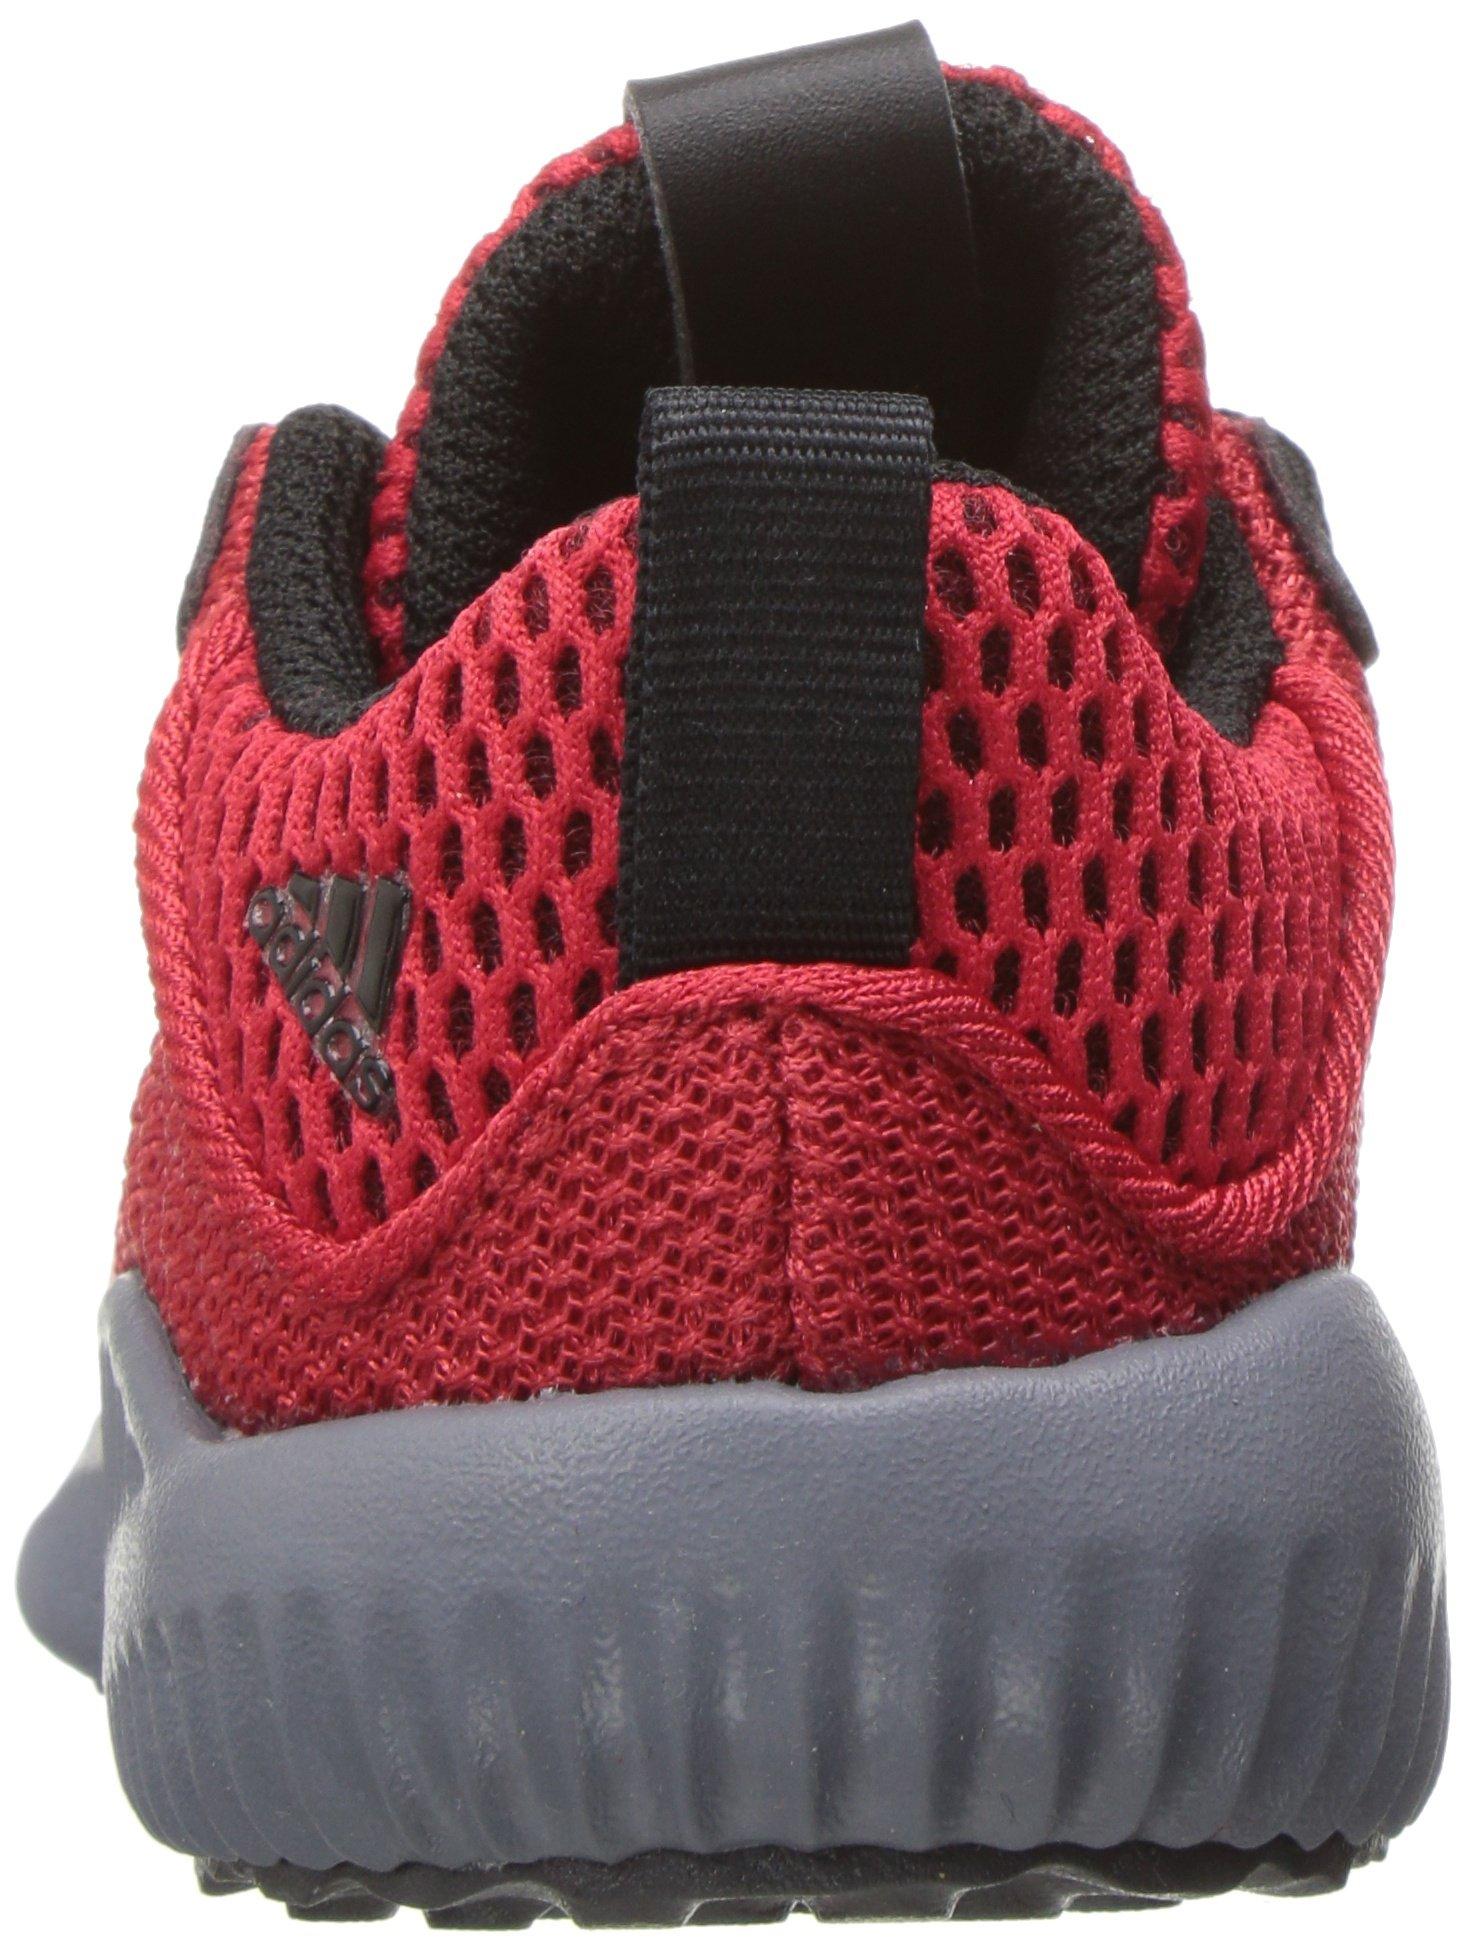 adidas Kids' Alphabounce Sneaker, Scarlet/Satellite/Black, 8 M US Toddler by adidas (Image #2)